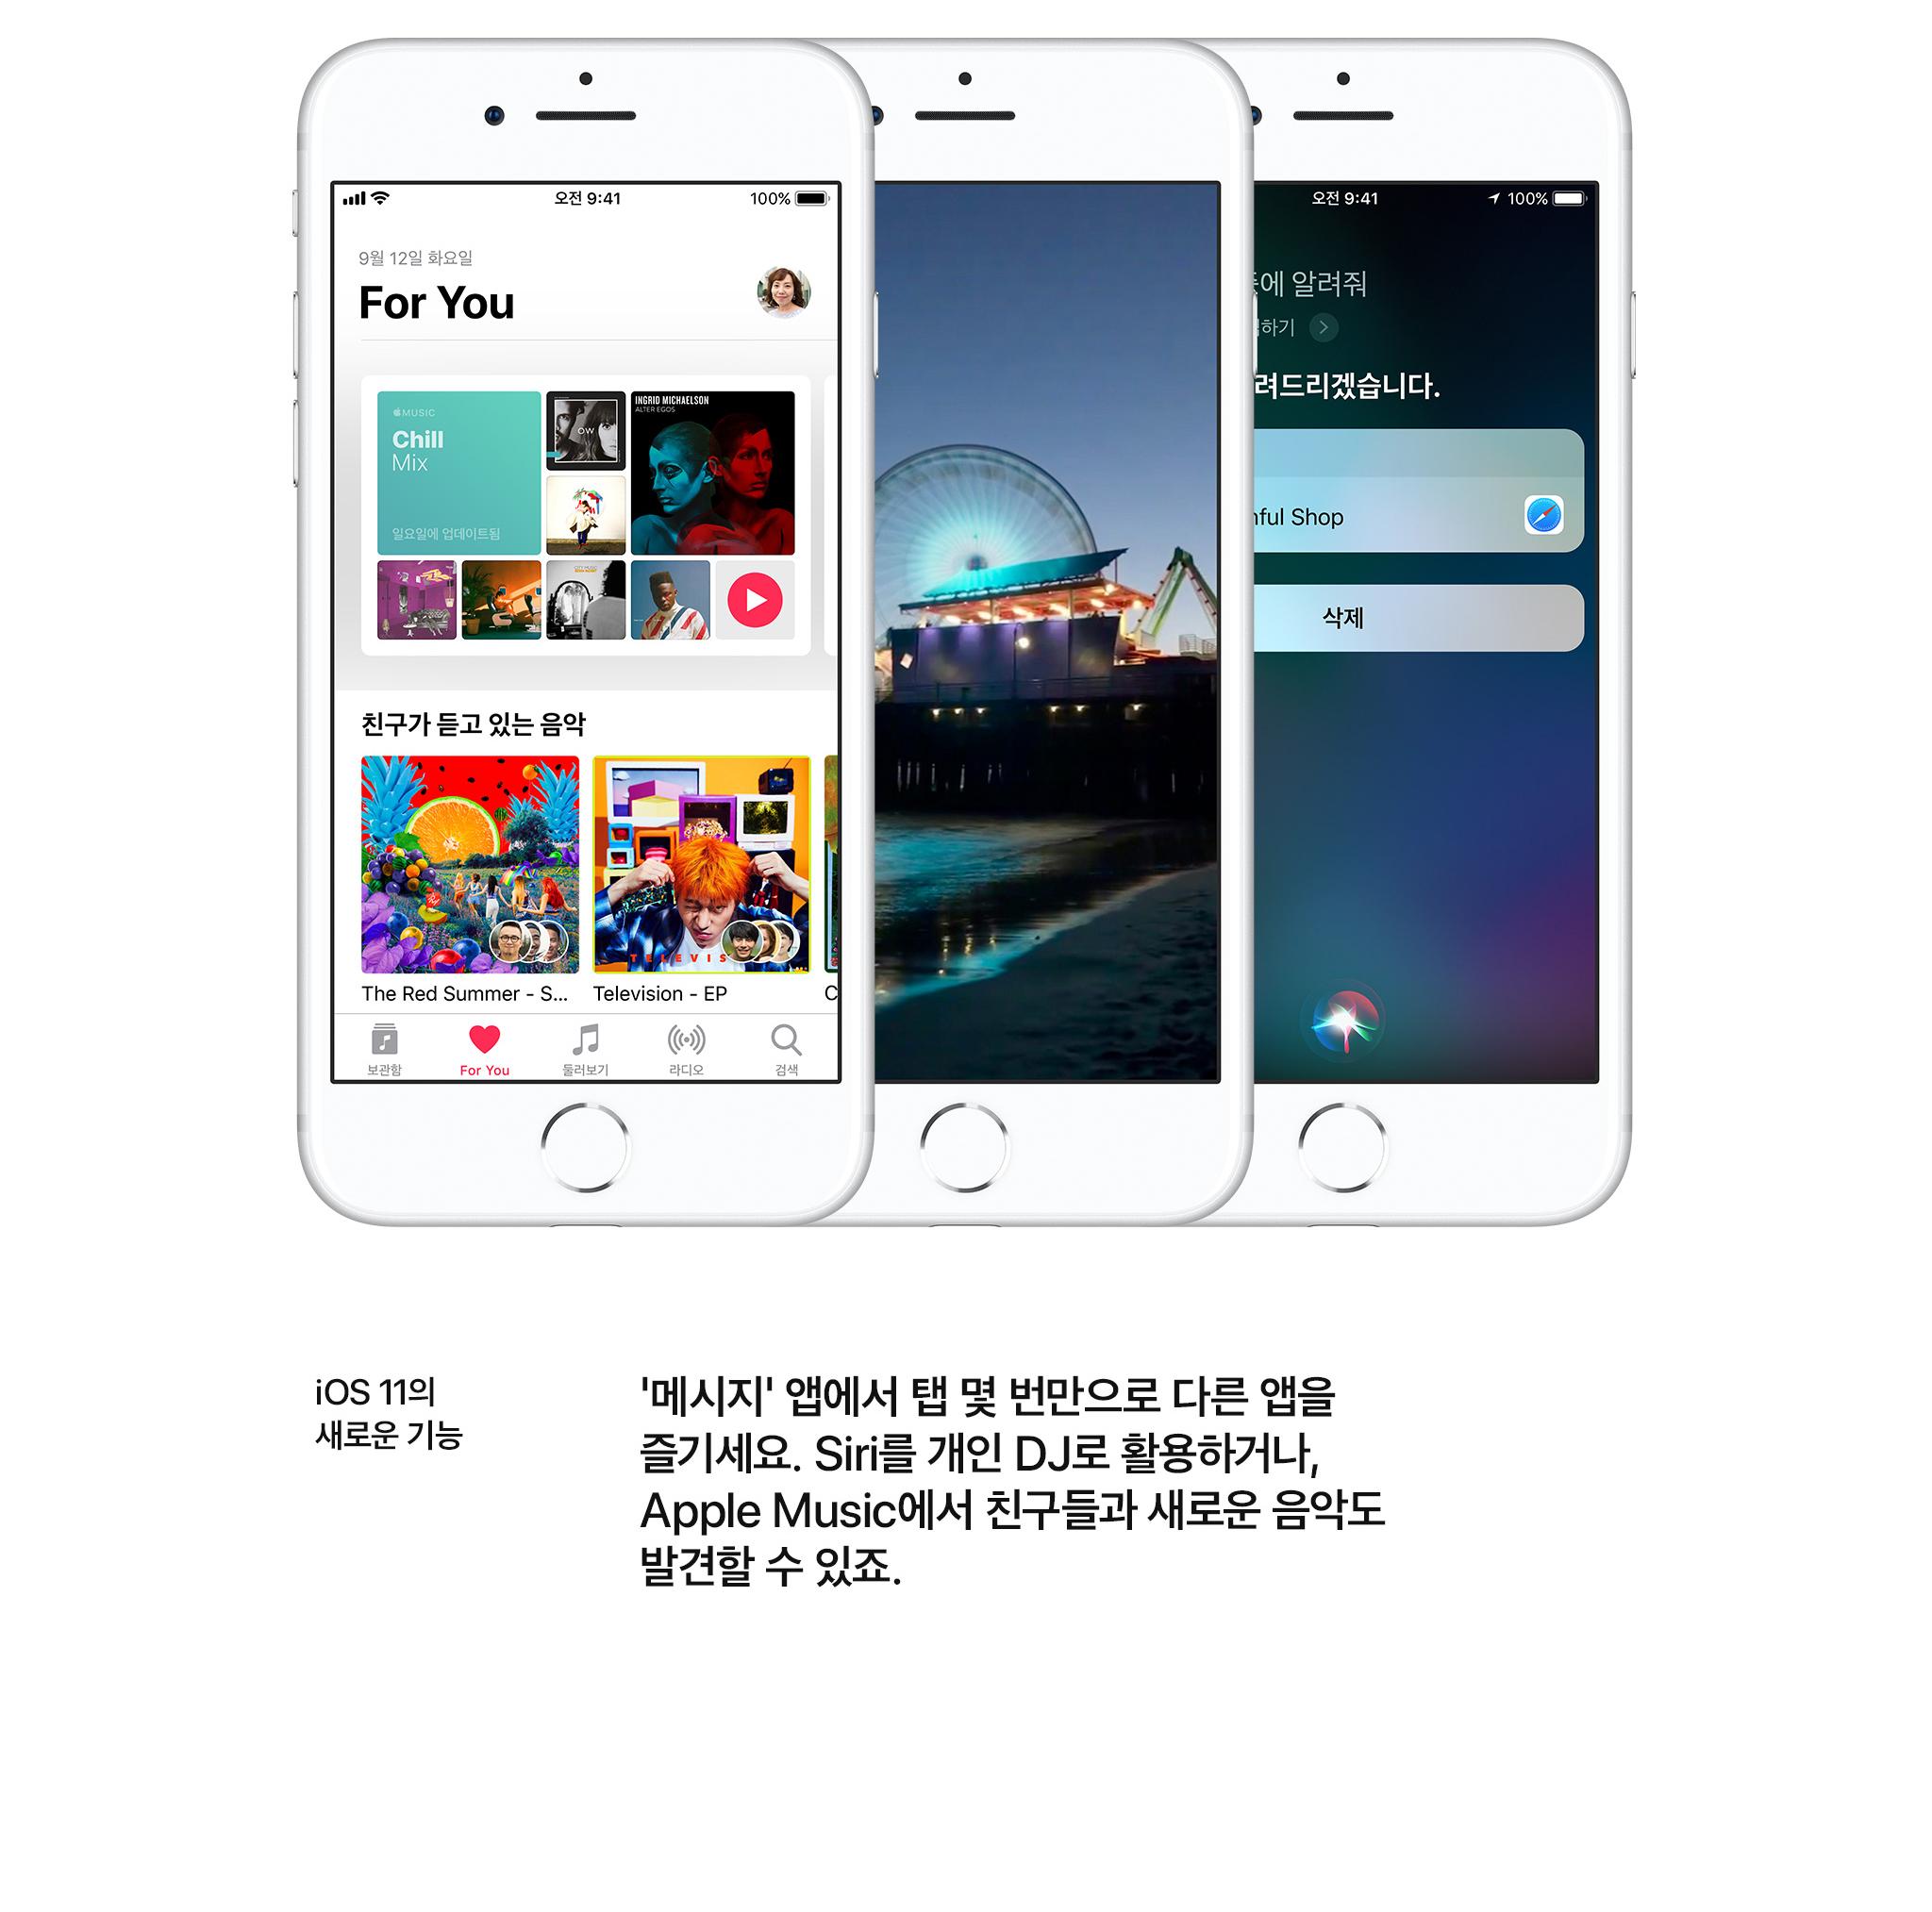 iOS 11의 새로운 기능 '메시지' 앱에서 탭 몇 번만으로 다른 앱을 즐기세요. Siri를 개인 DJ로 활용하거나, Apple Music에서 친구들과 새로운 음악도 발견할 수 있죠.